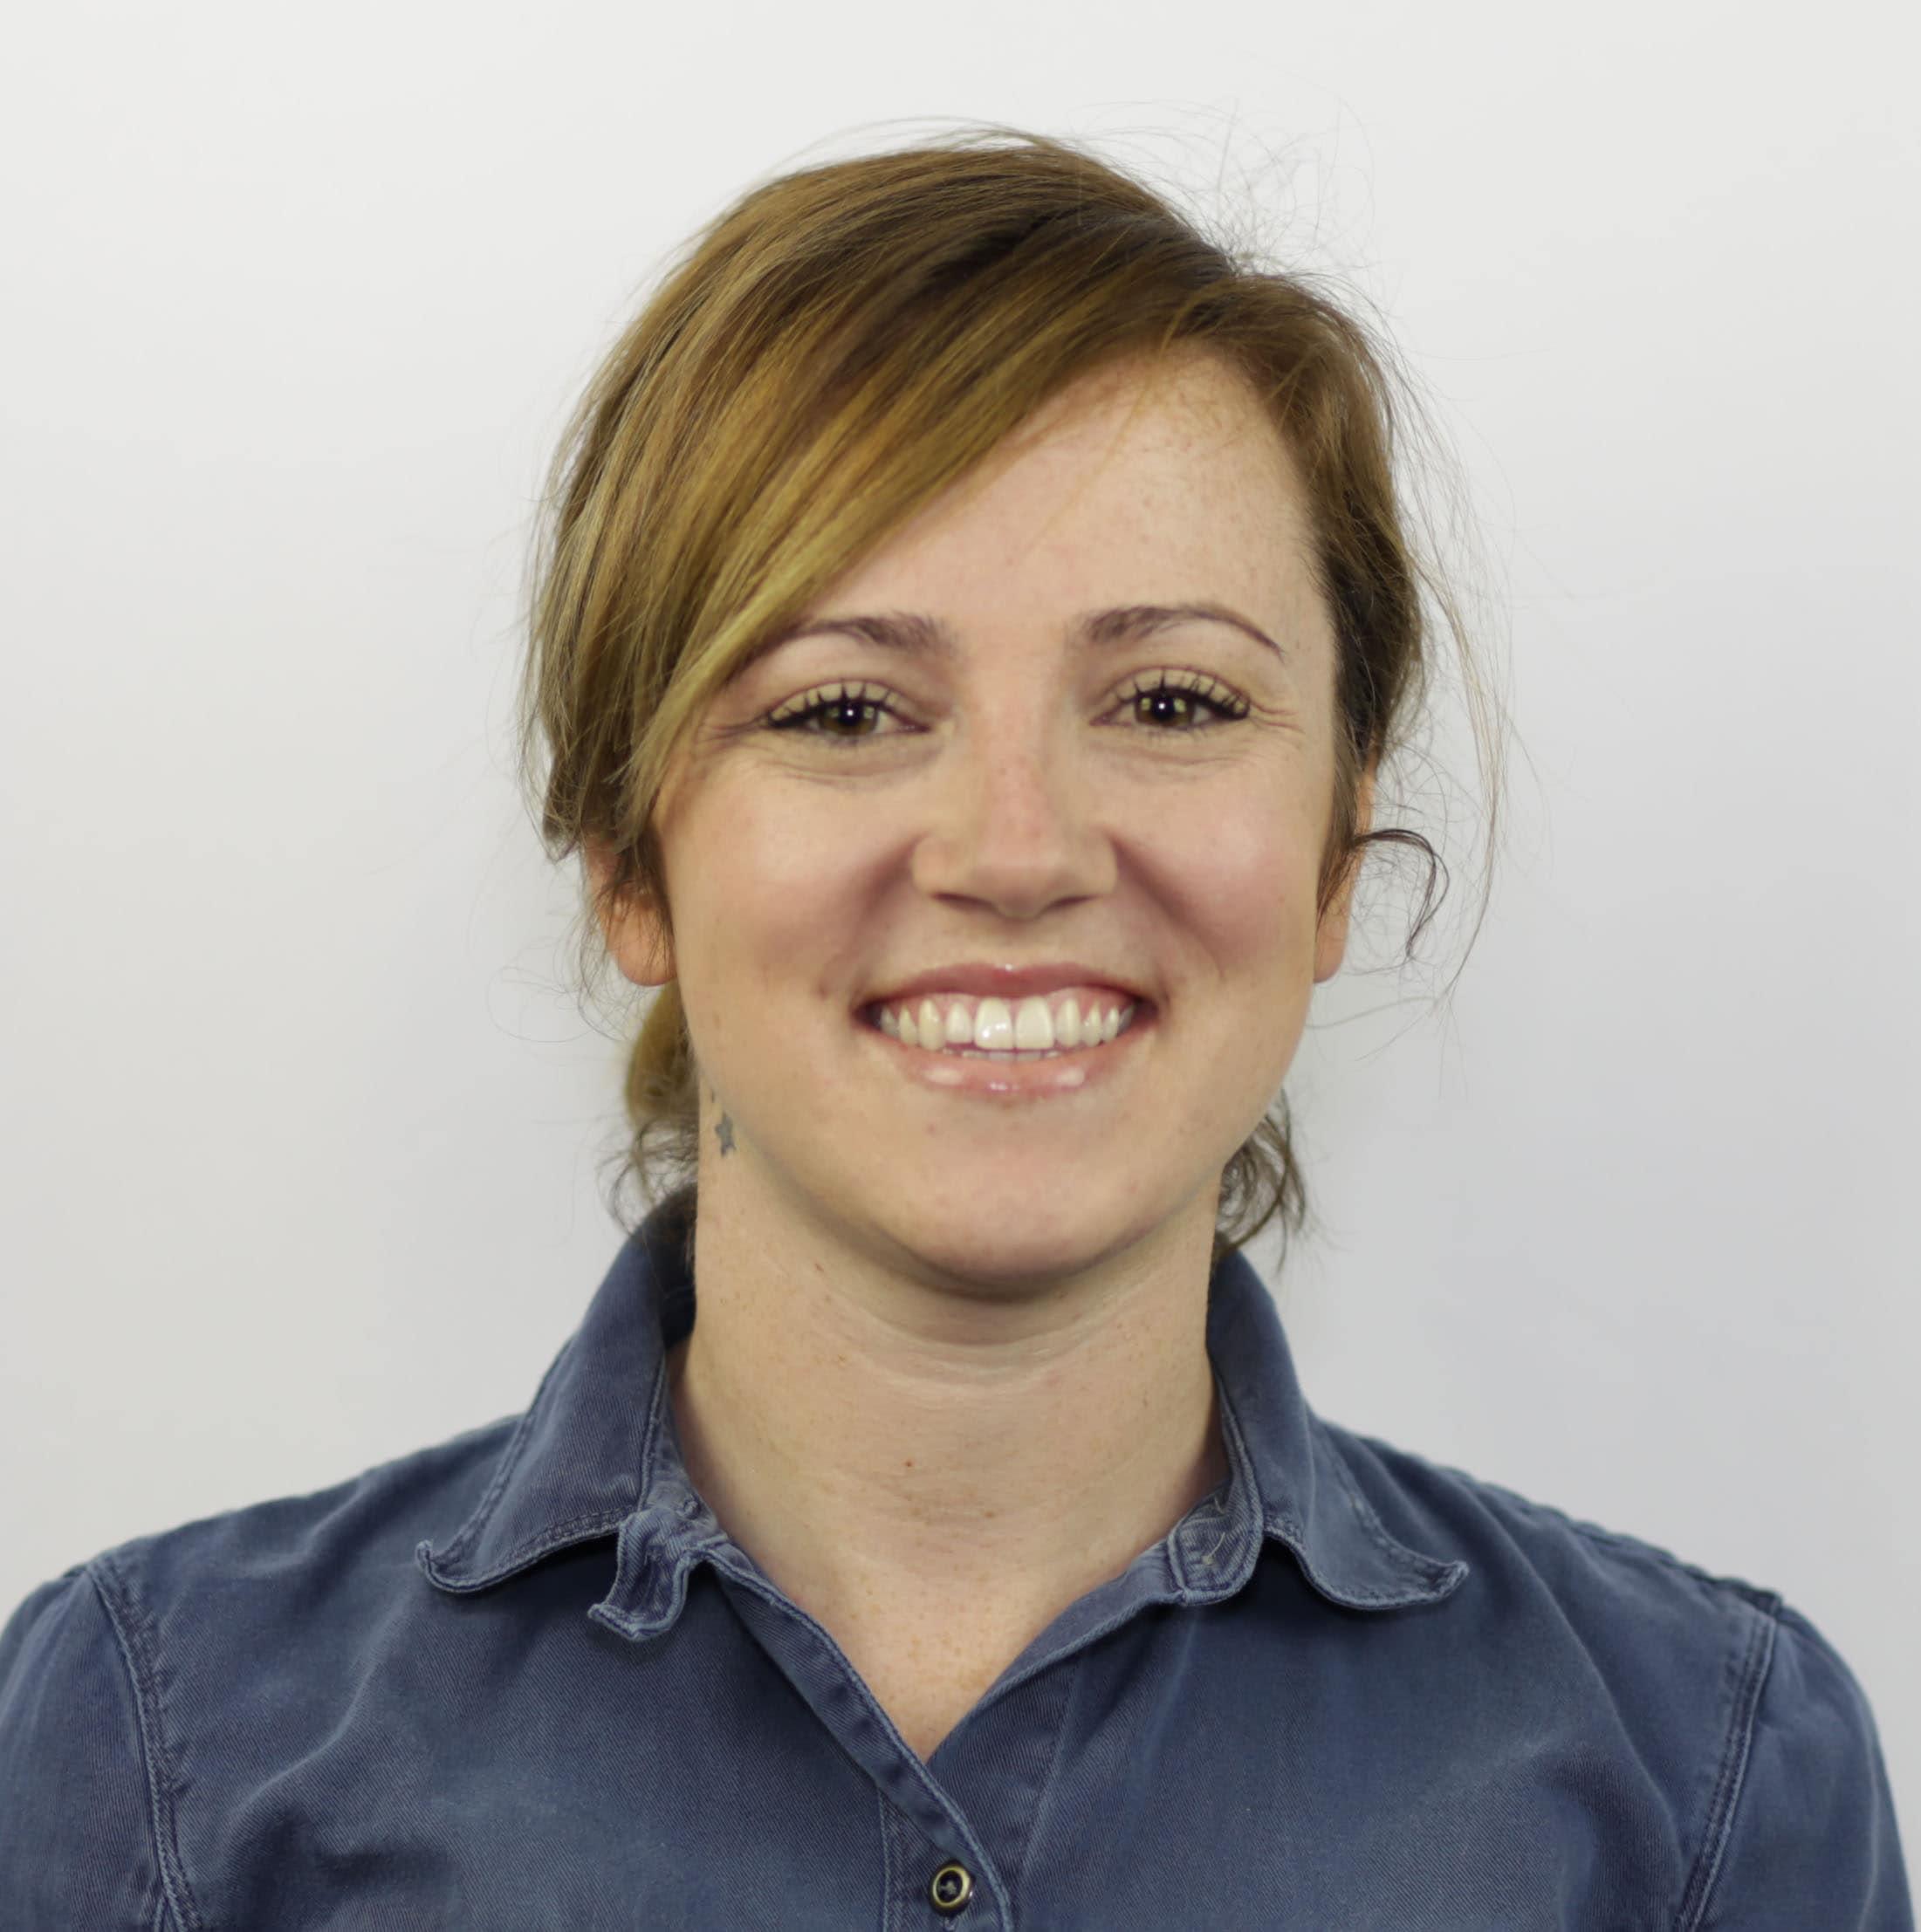 Claire Nolan